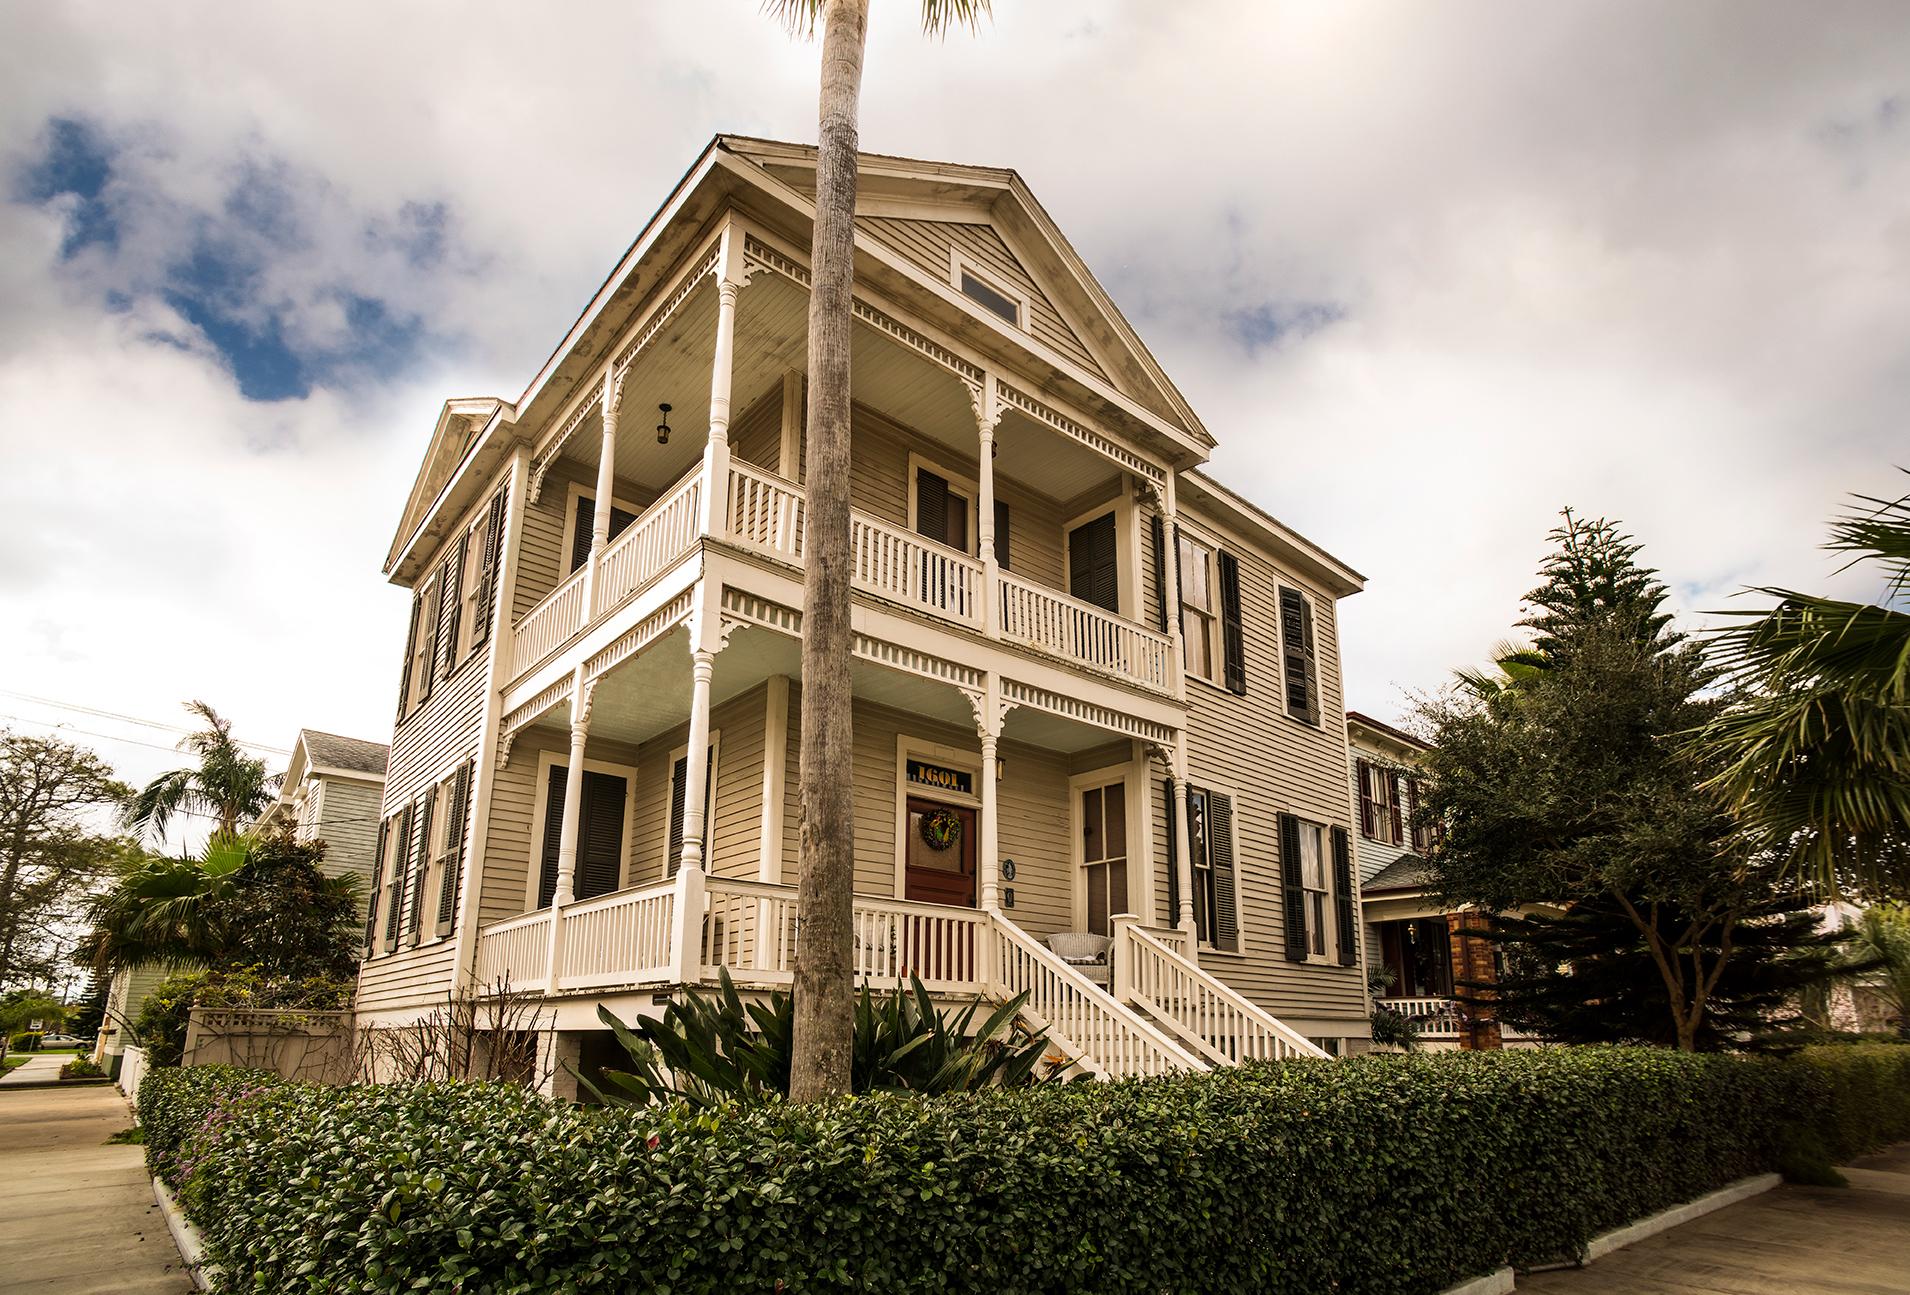 Galveston Historic Homes Tour Special Events Galveston